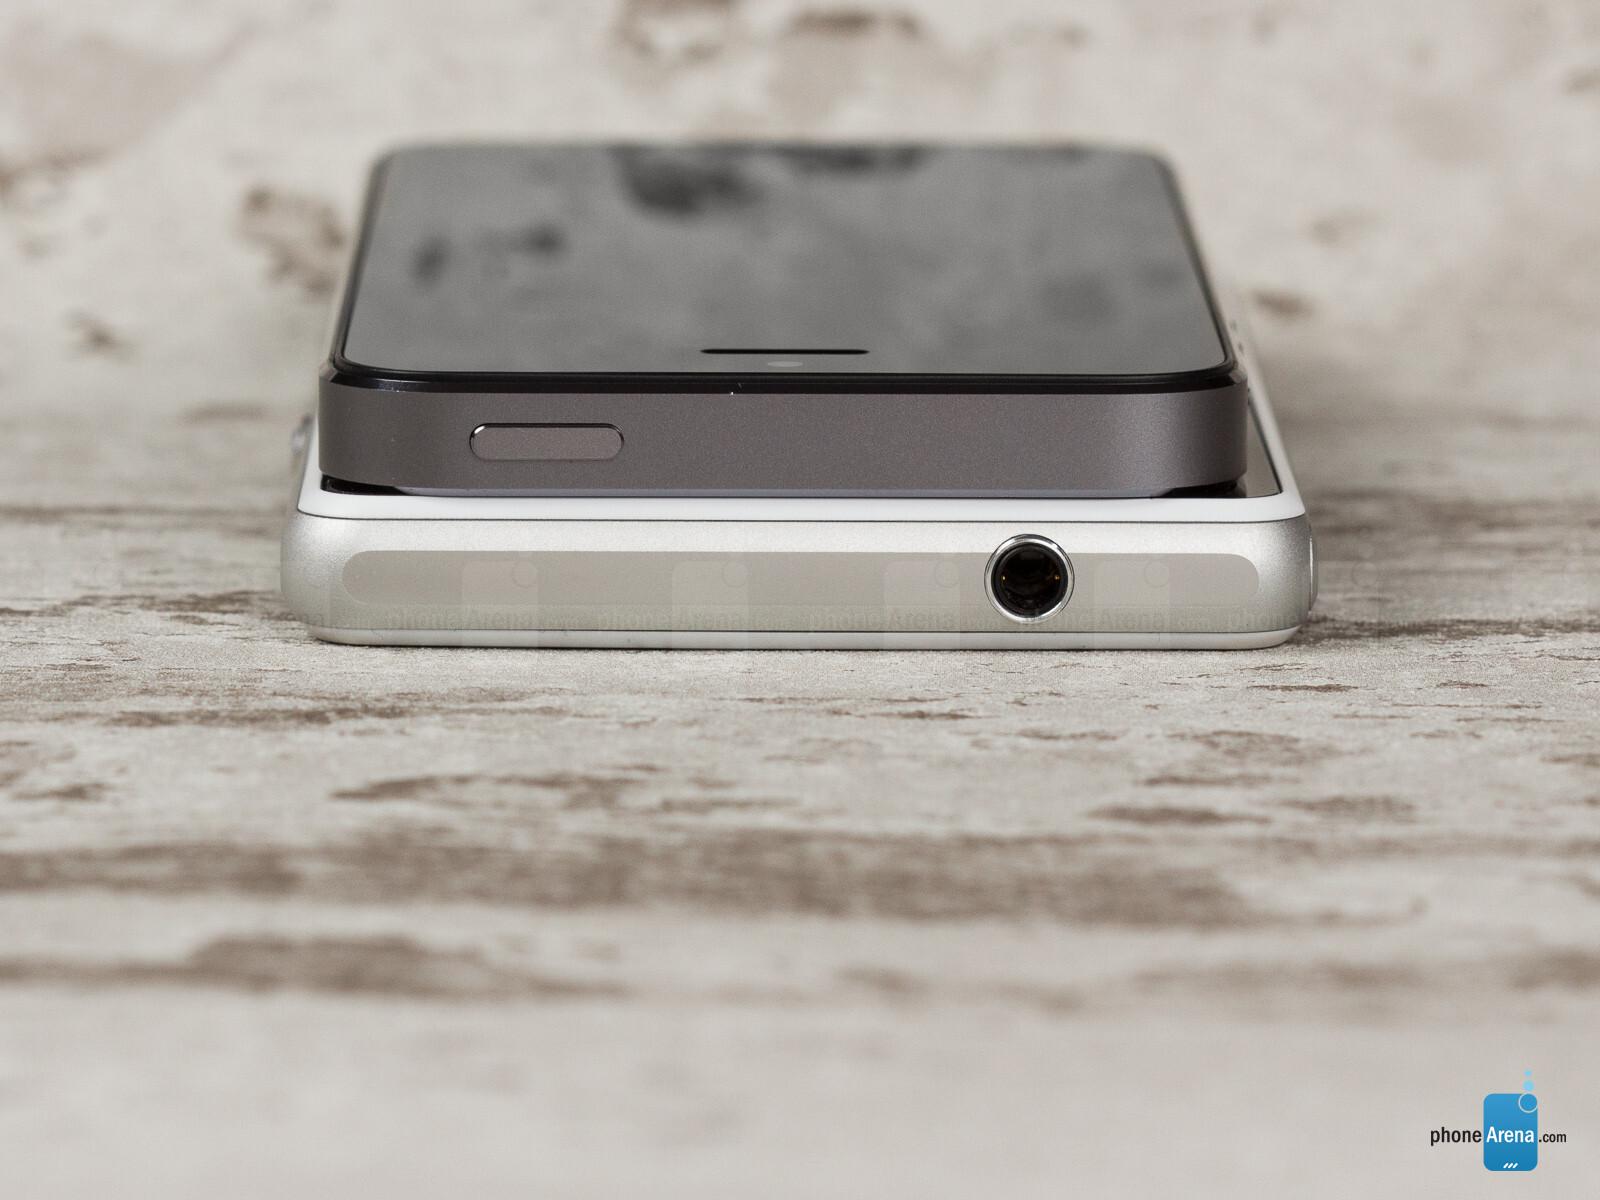 camera xperia z1 compact vs iphone 5s